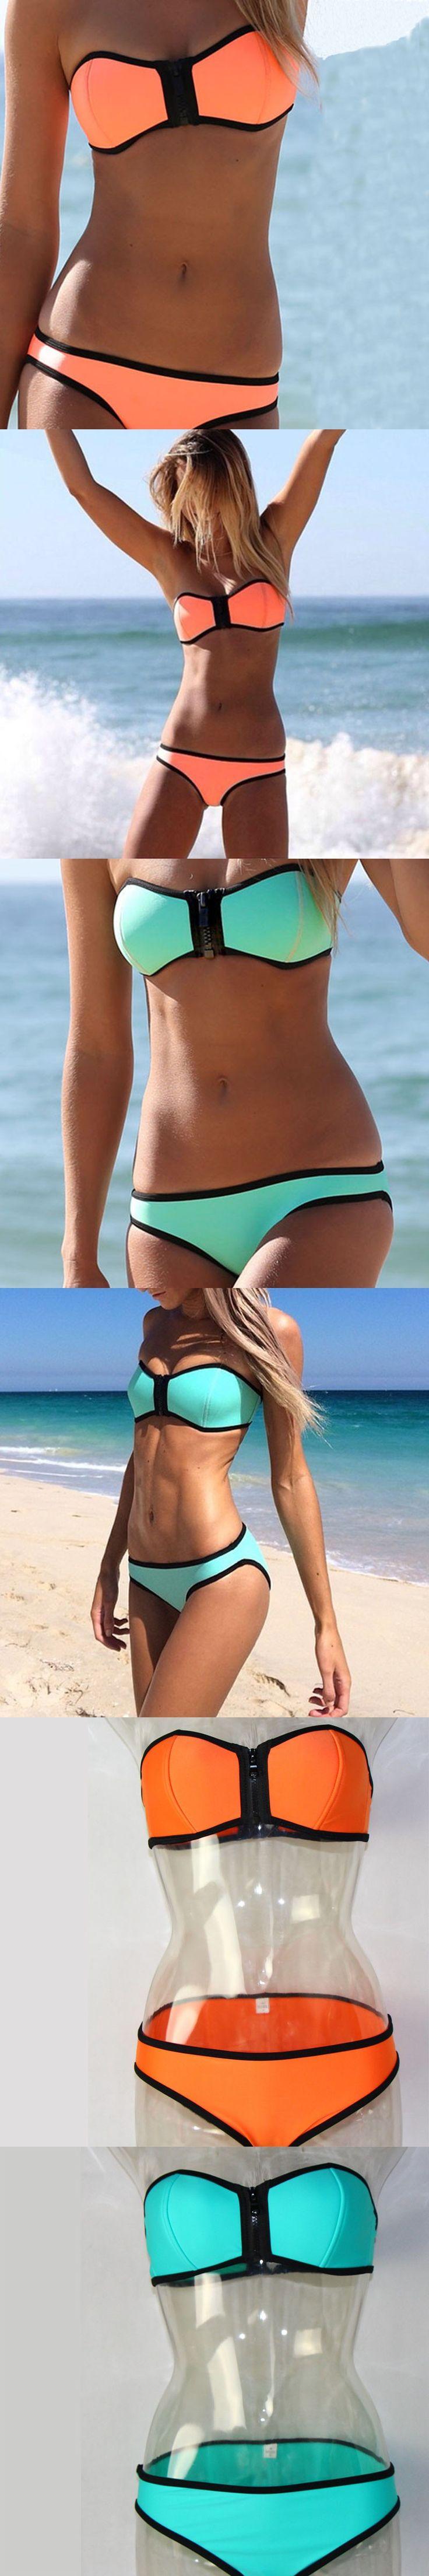 1528 best images about neoprene bikini on pinterest triangle swimwear push up bikini and. Black Bedroom Furniture Sets. Home Design Ideas